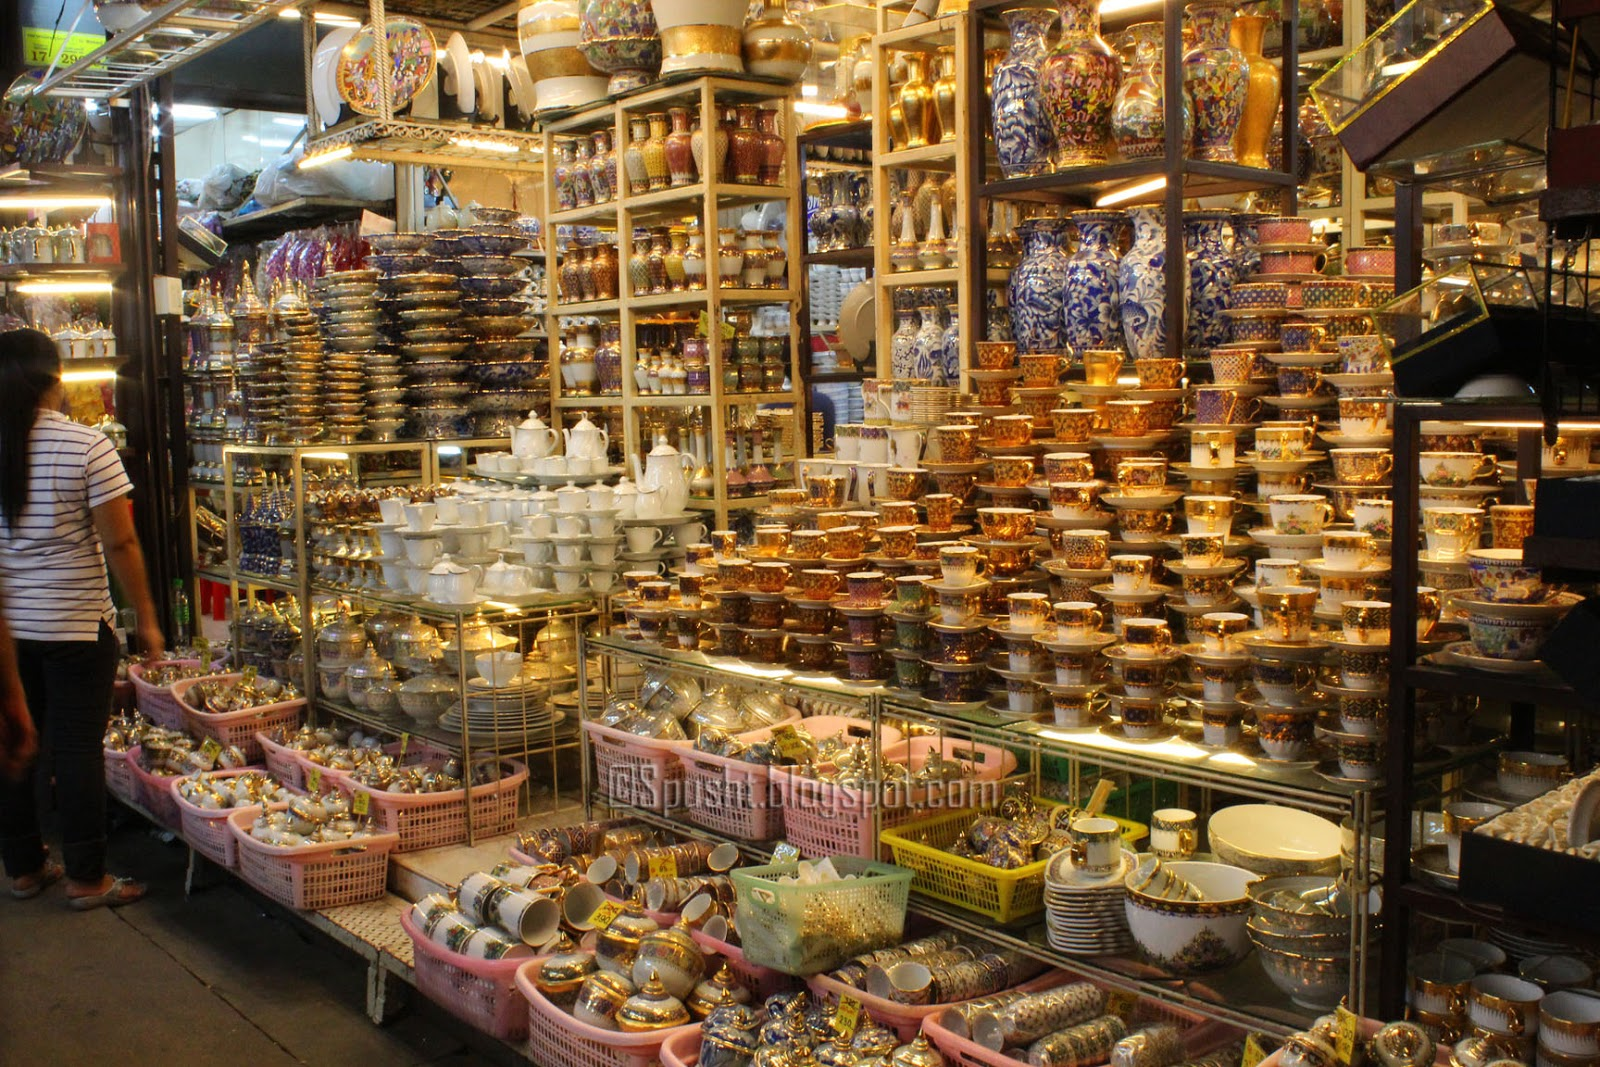 Spusht: Chatuchak Market, Jatujak, JJ Market - same thing